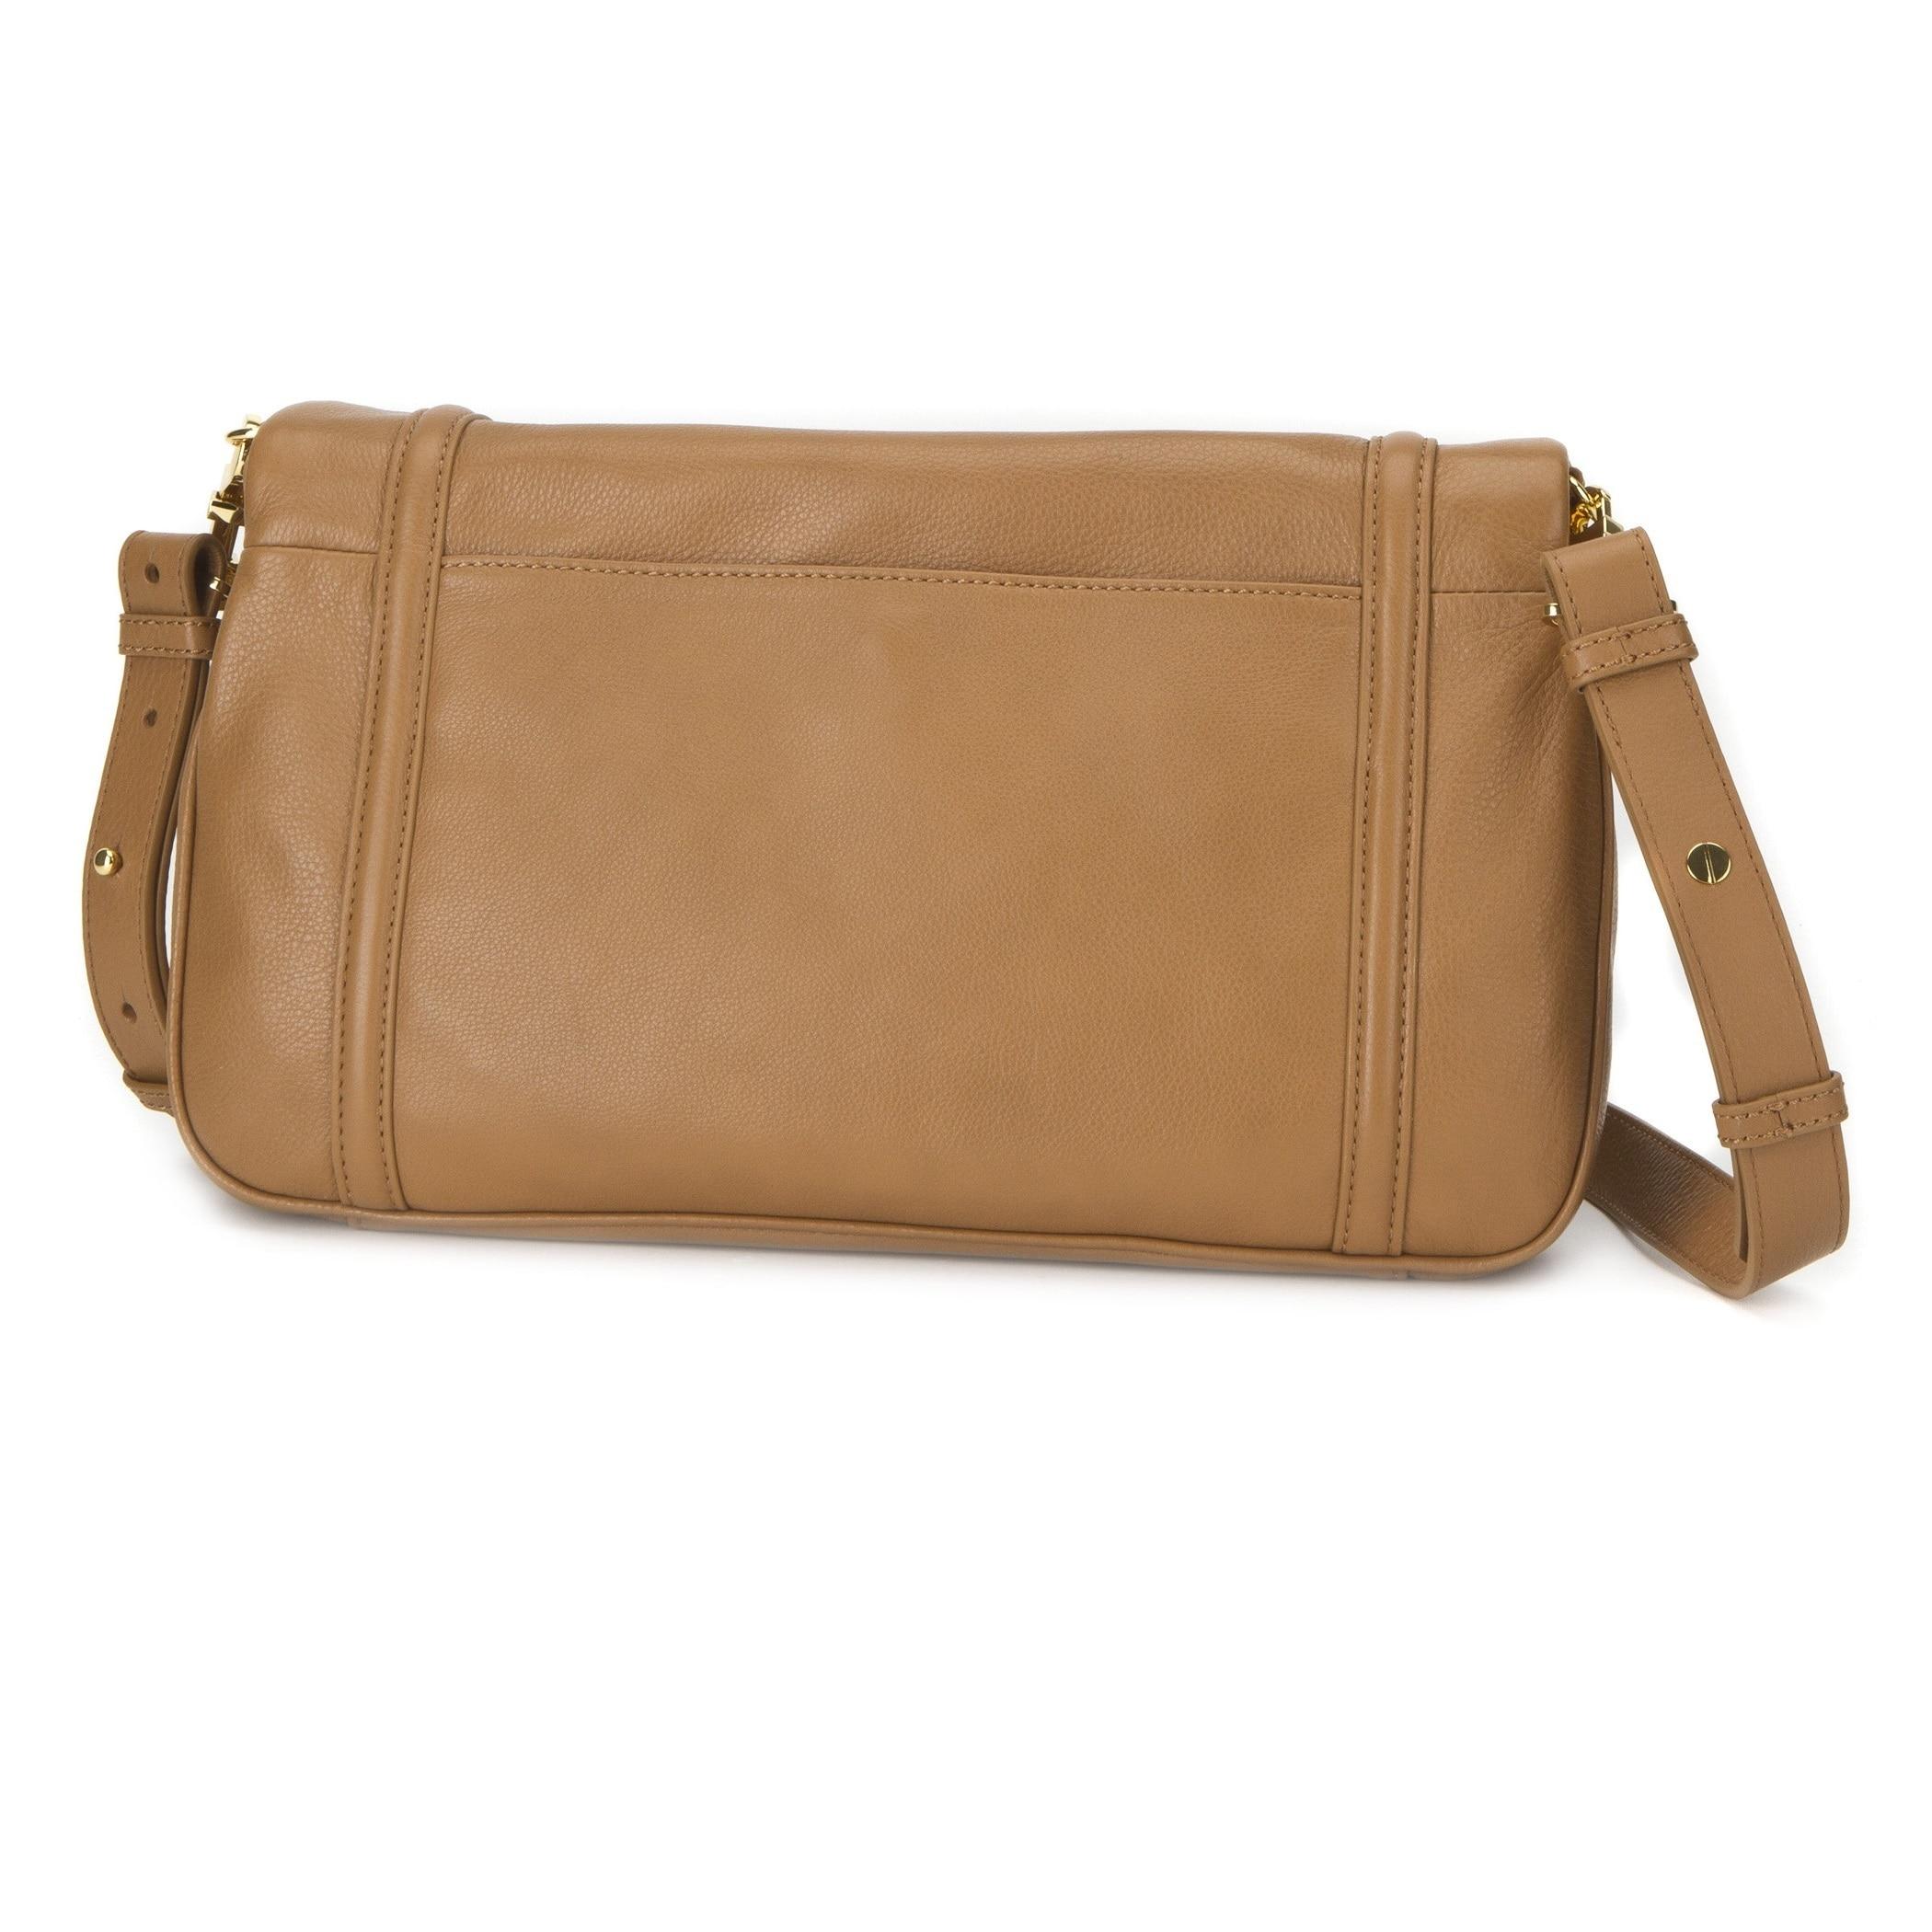 7033cc608e9798 Shop Tory Burch Amanda Foldover Royal Tan Messenger Bag - Free Shipping  Today - Overstock - 9616993